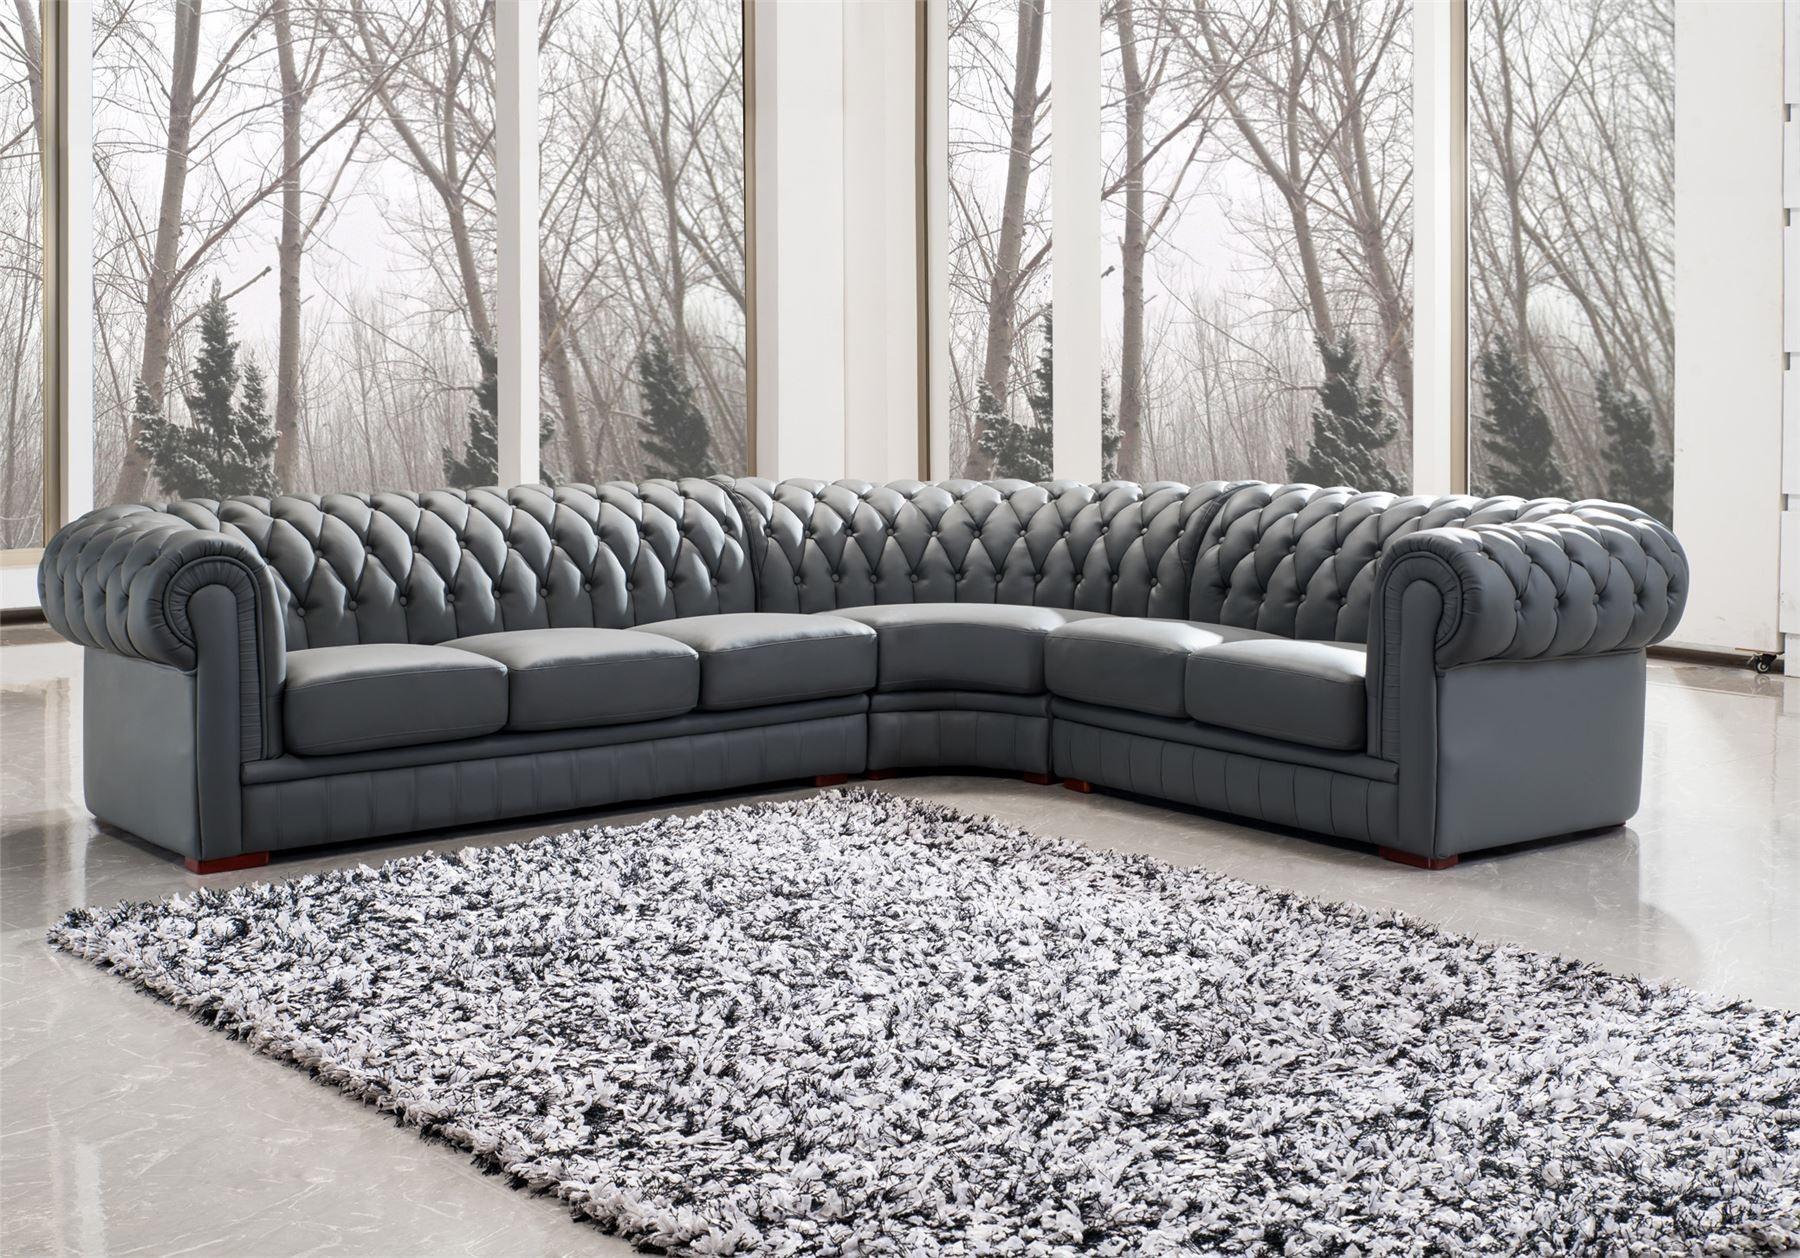 75 The Best L Shaped Sleeper Sofa Ikea | Sofa Sofa | Tehranmix with Leather Sectional San Diego